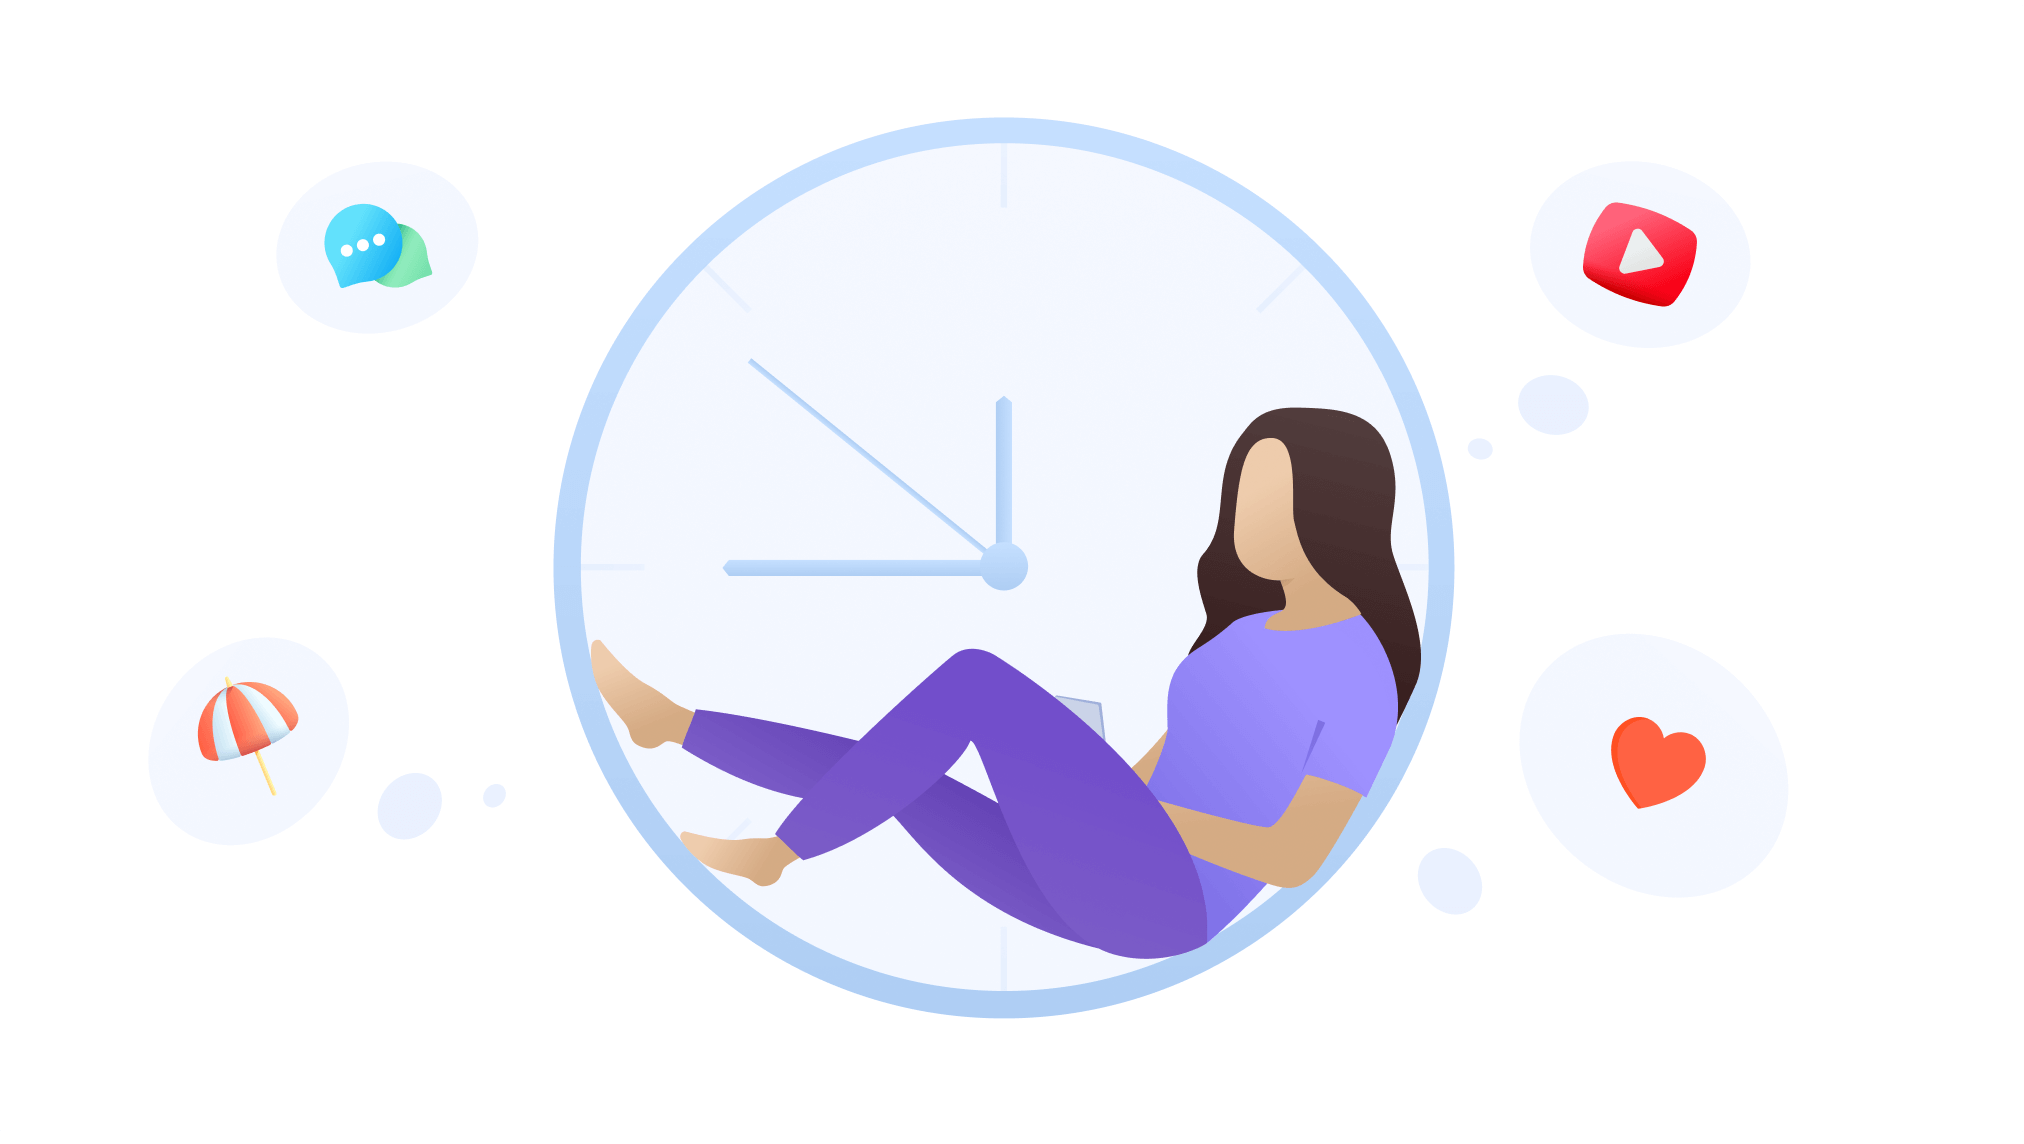 time management: beating procrastination